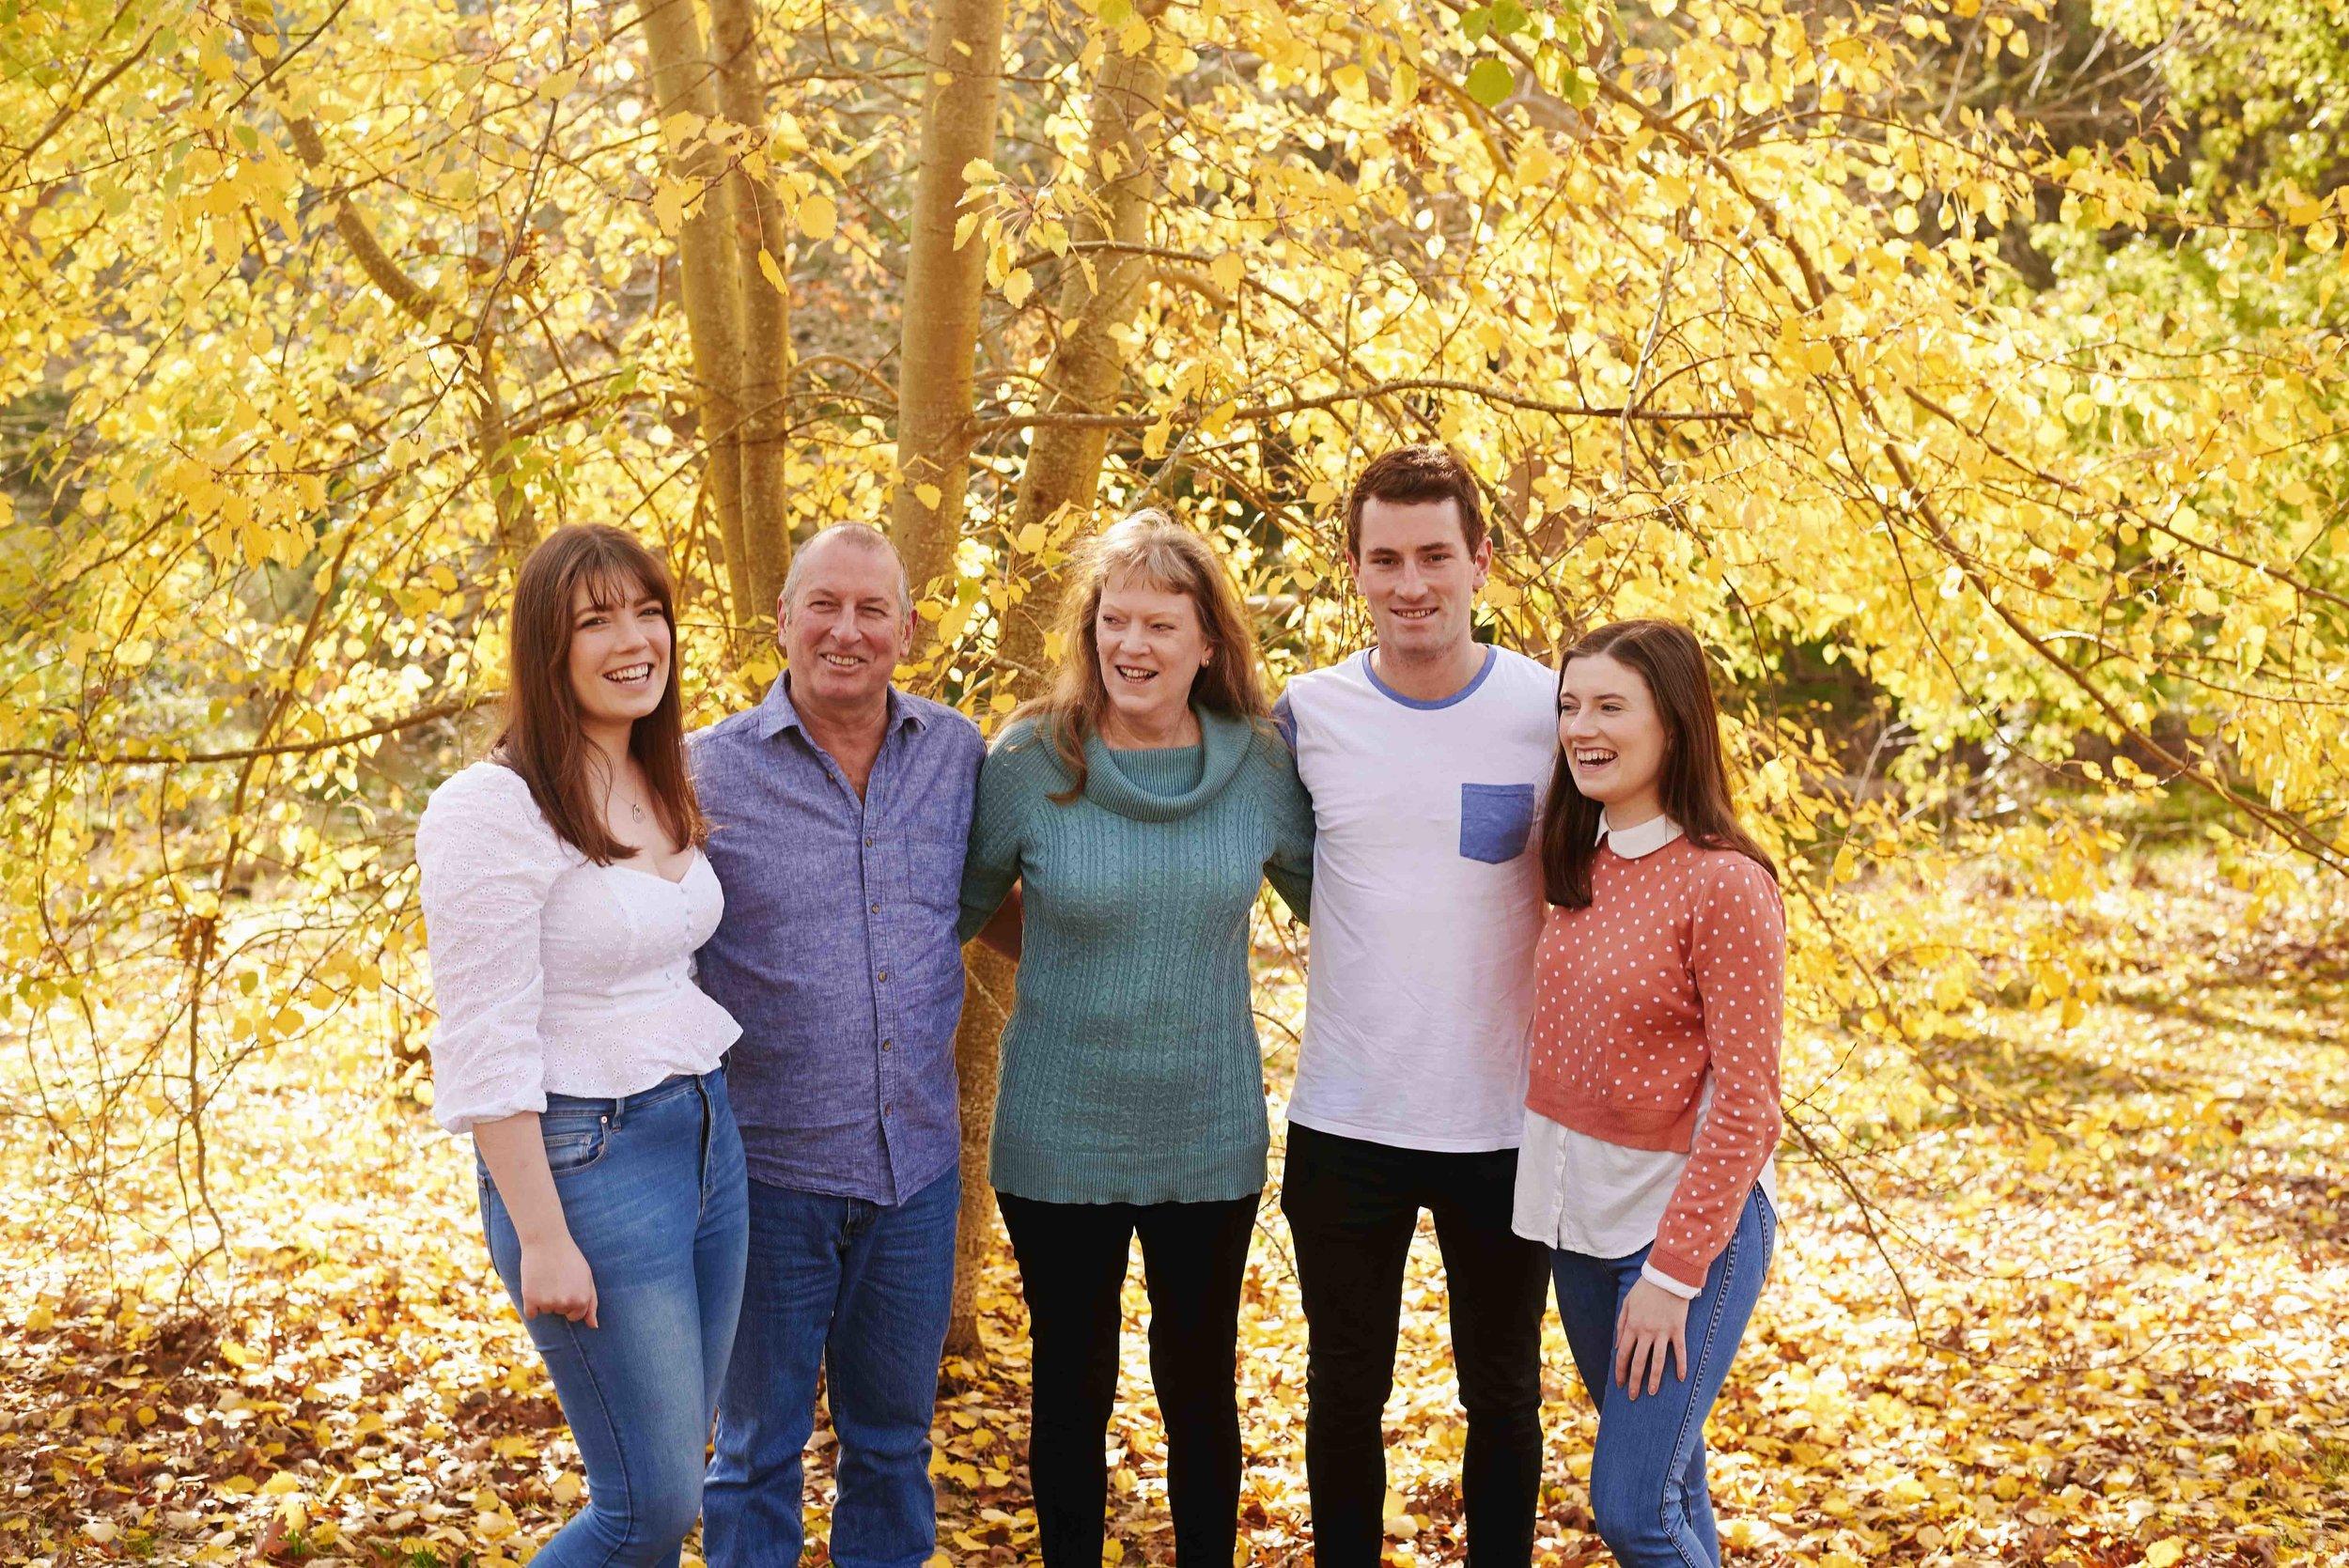 mornington-peninsula-family-photographer-marissa-jade-photography-families-red-hill-5.jpg